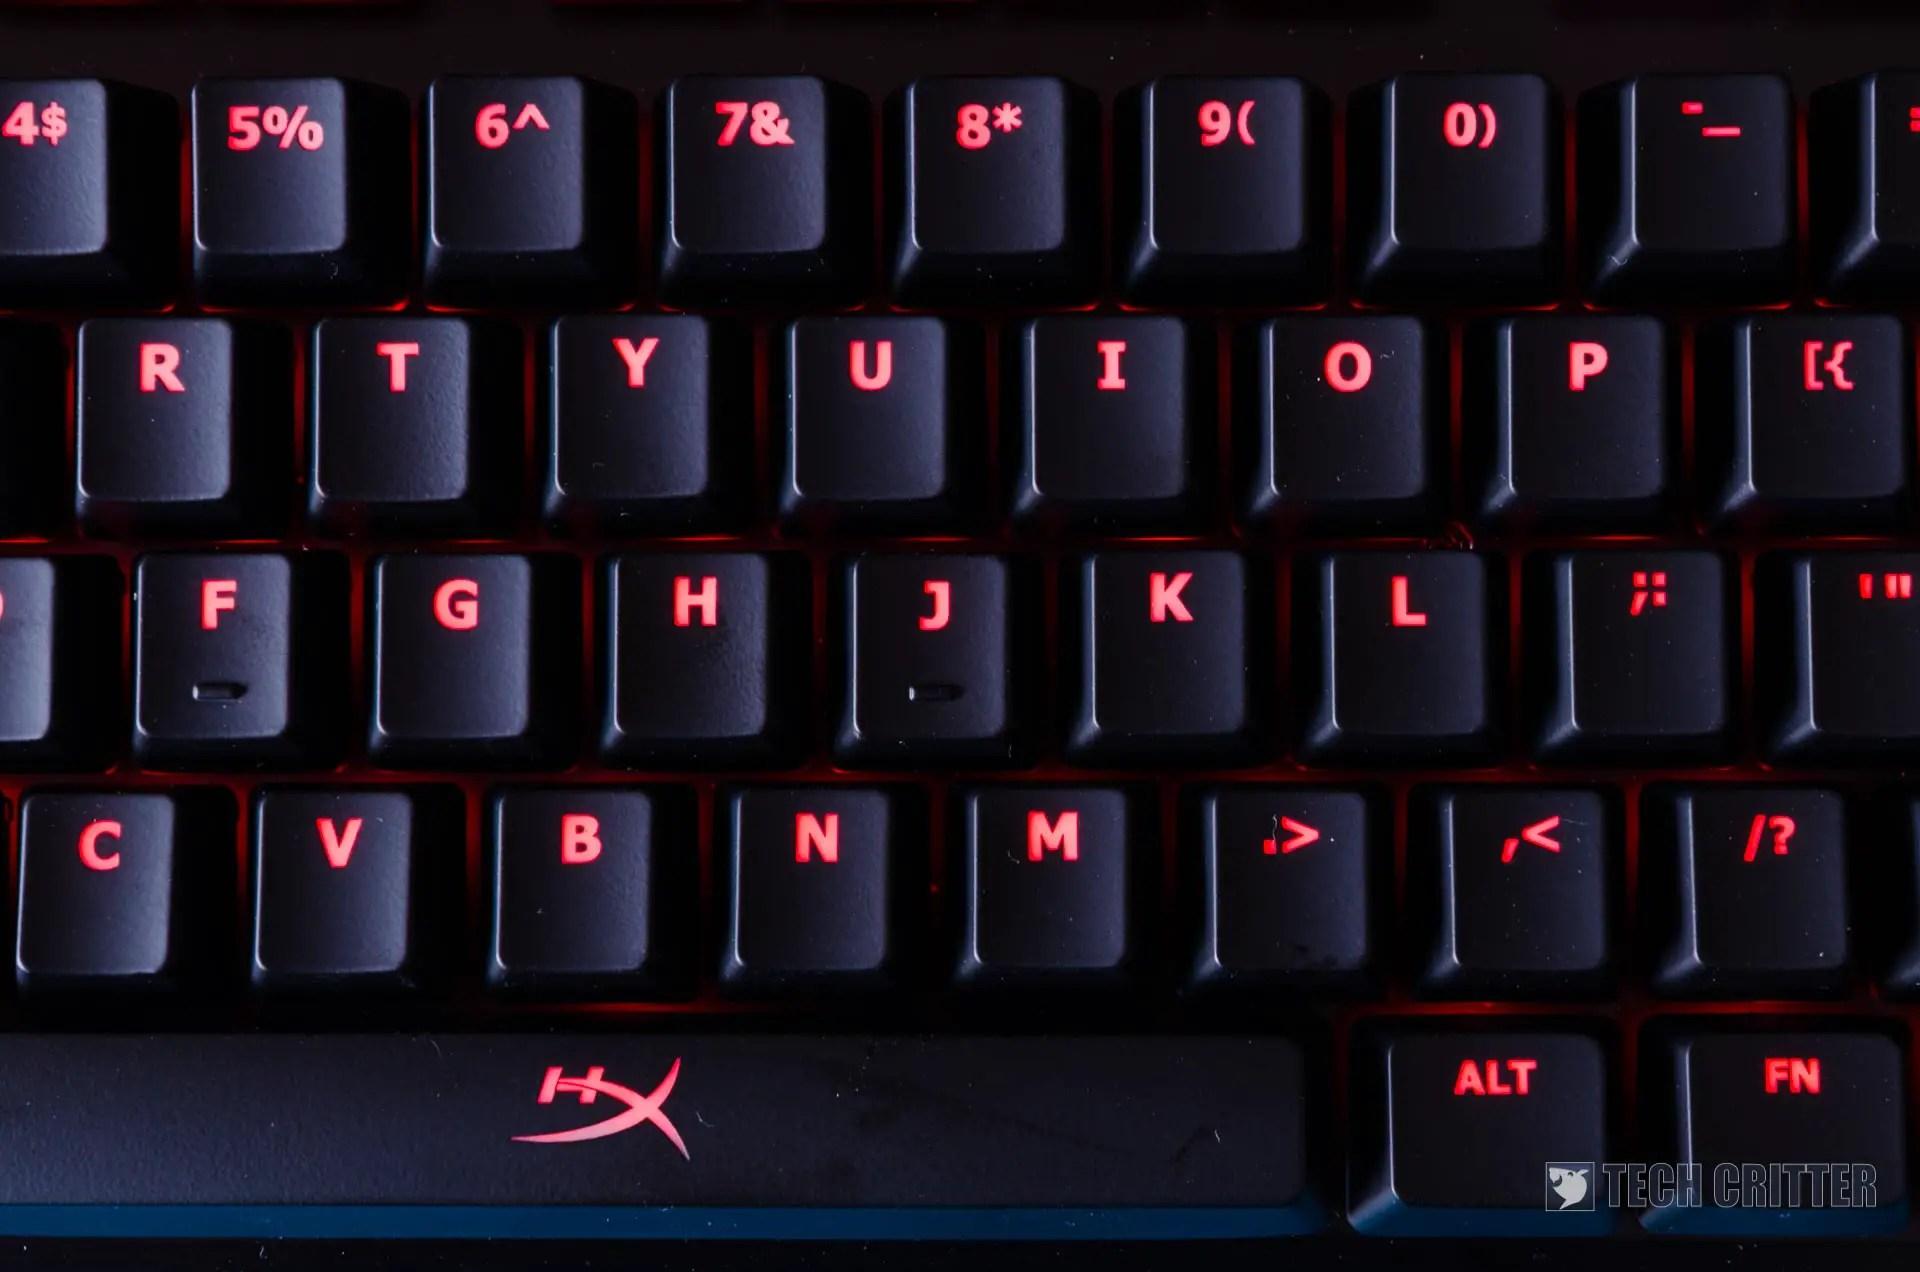 Review - HyperX ALLOY FPS Mechanical Keyboard